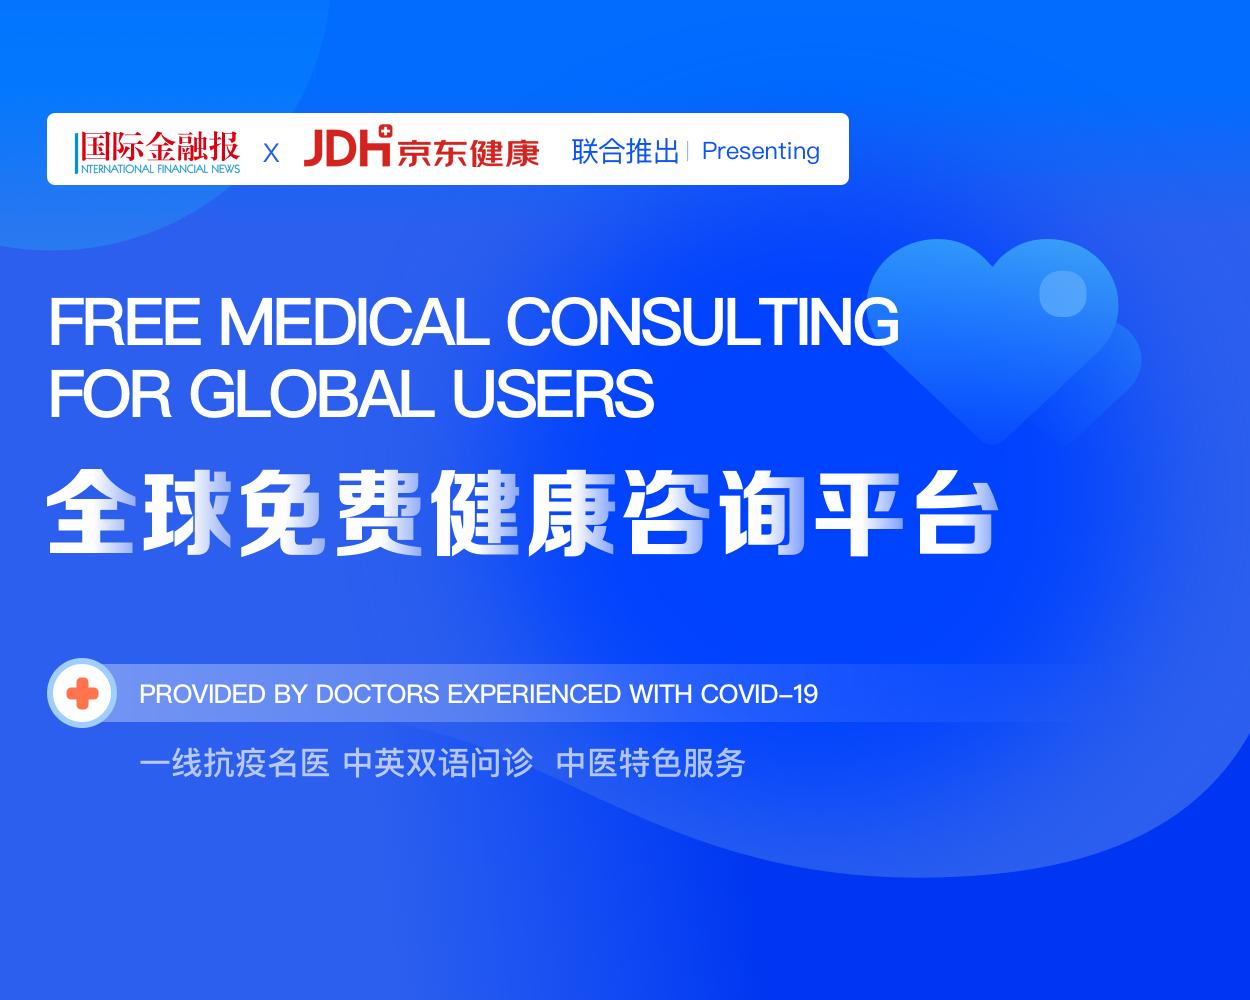 http://www.shangoudaohang.com/nongcun/302696.html